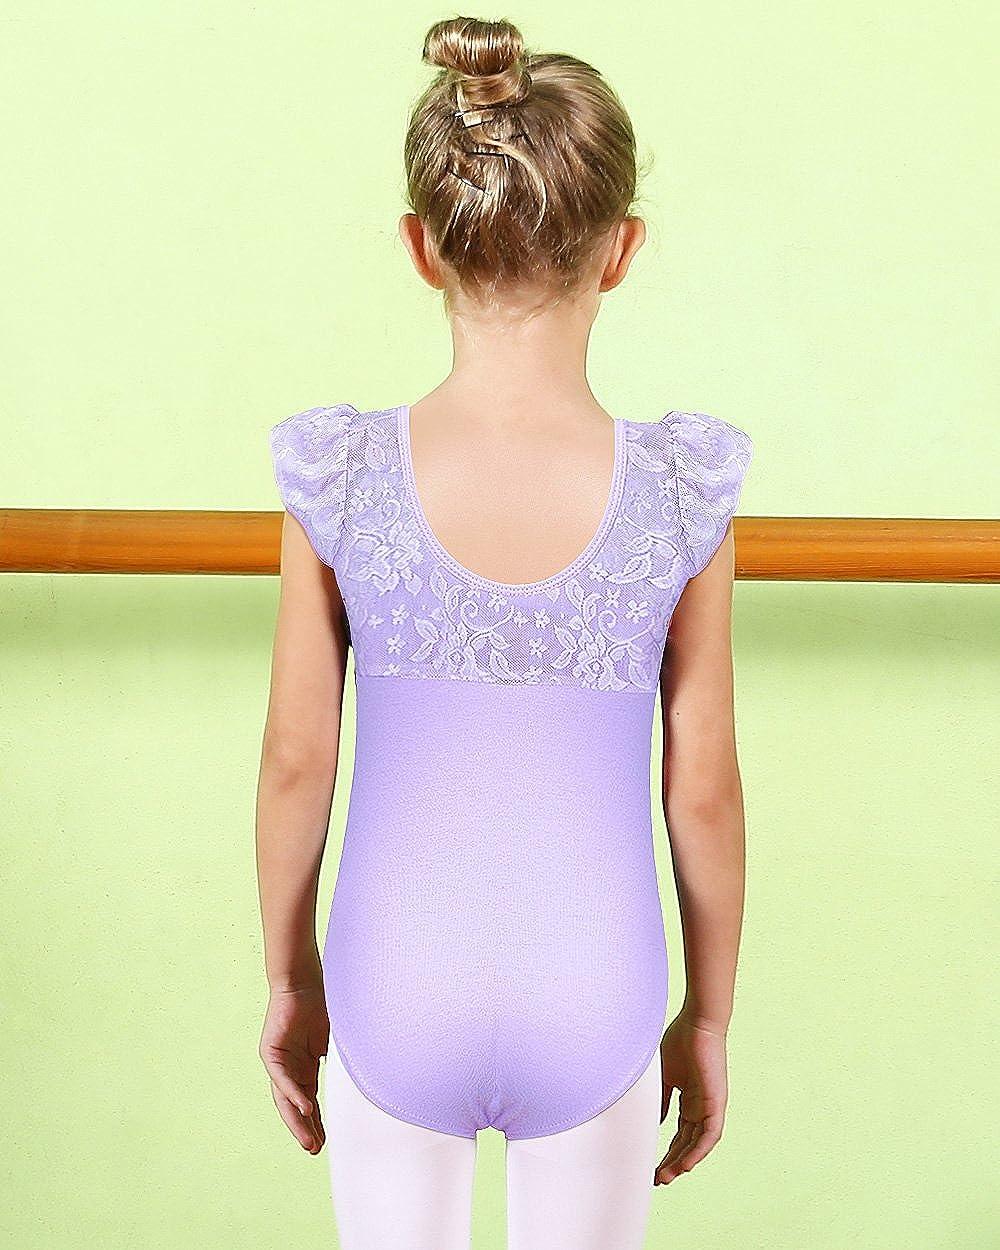 BAOHULU Girl Flutter Ruffle Dance Ballet flower Lace Short Sleeve Bow Leotard